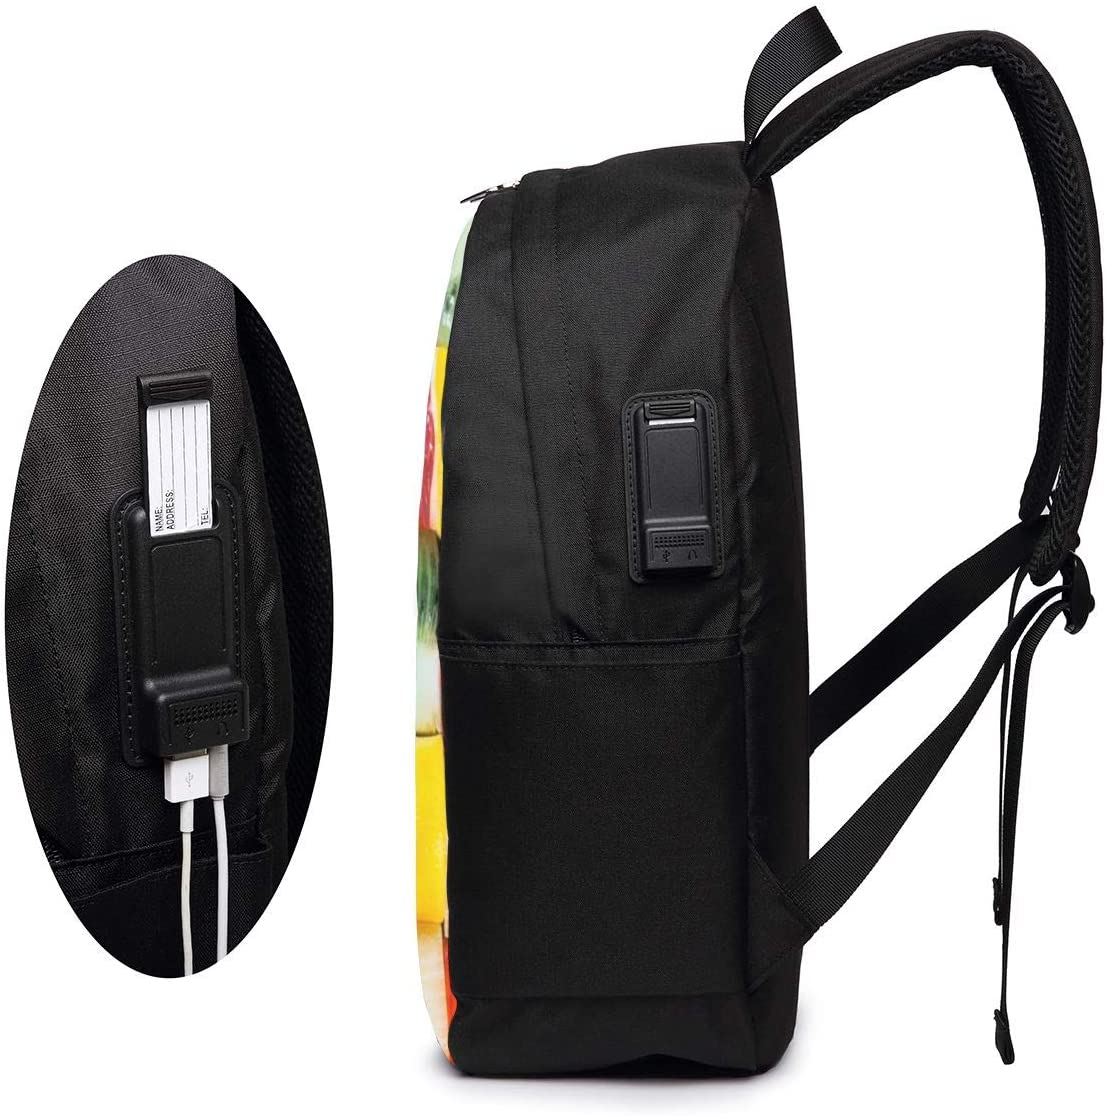 Tropical Fruits Laptop Backpack 17 Inch Business Travel Backpacks for Men Women Adjustable Shoulder Strap with USB Charging Port Black Mens and Womens for School